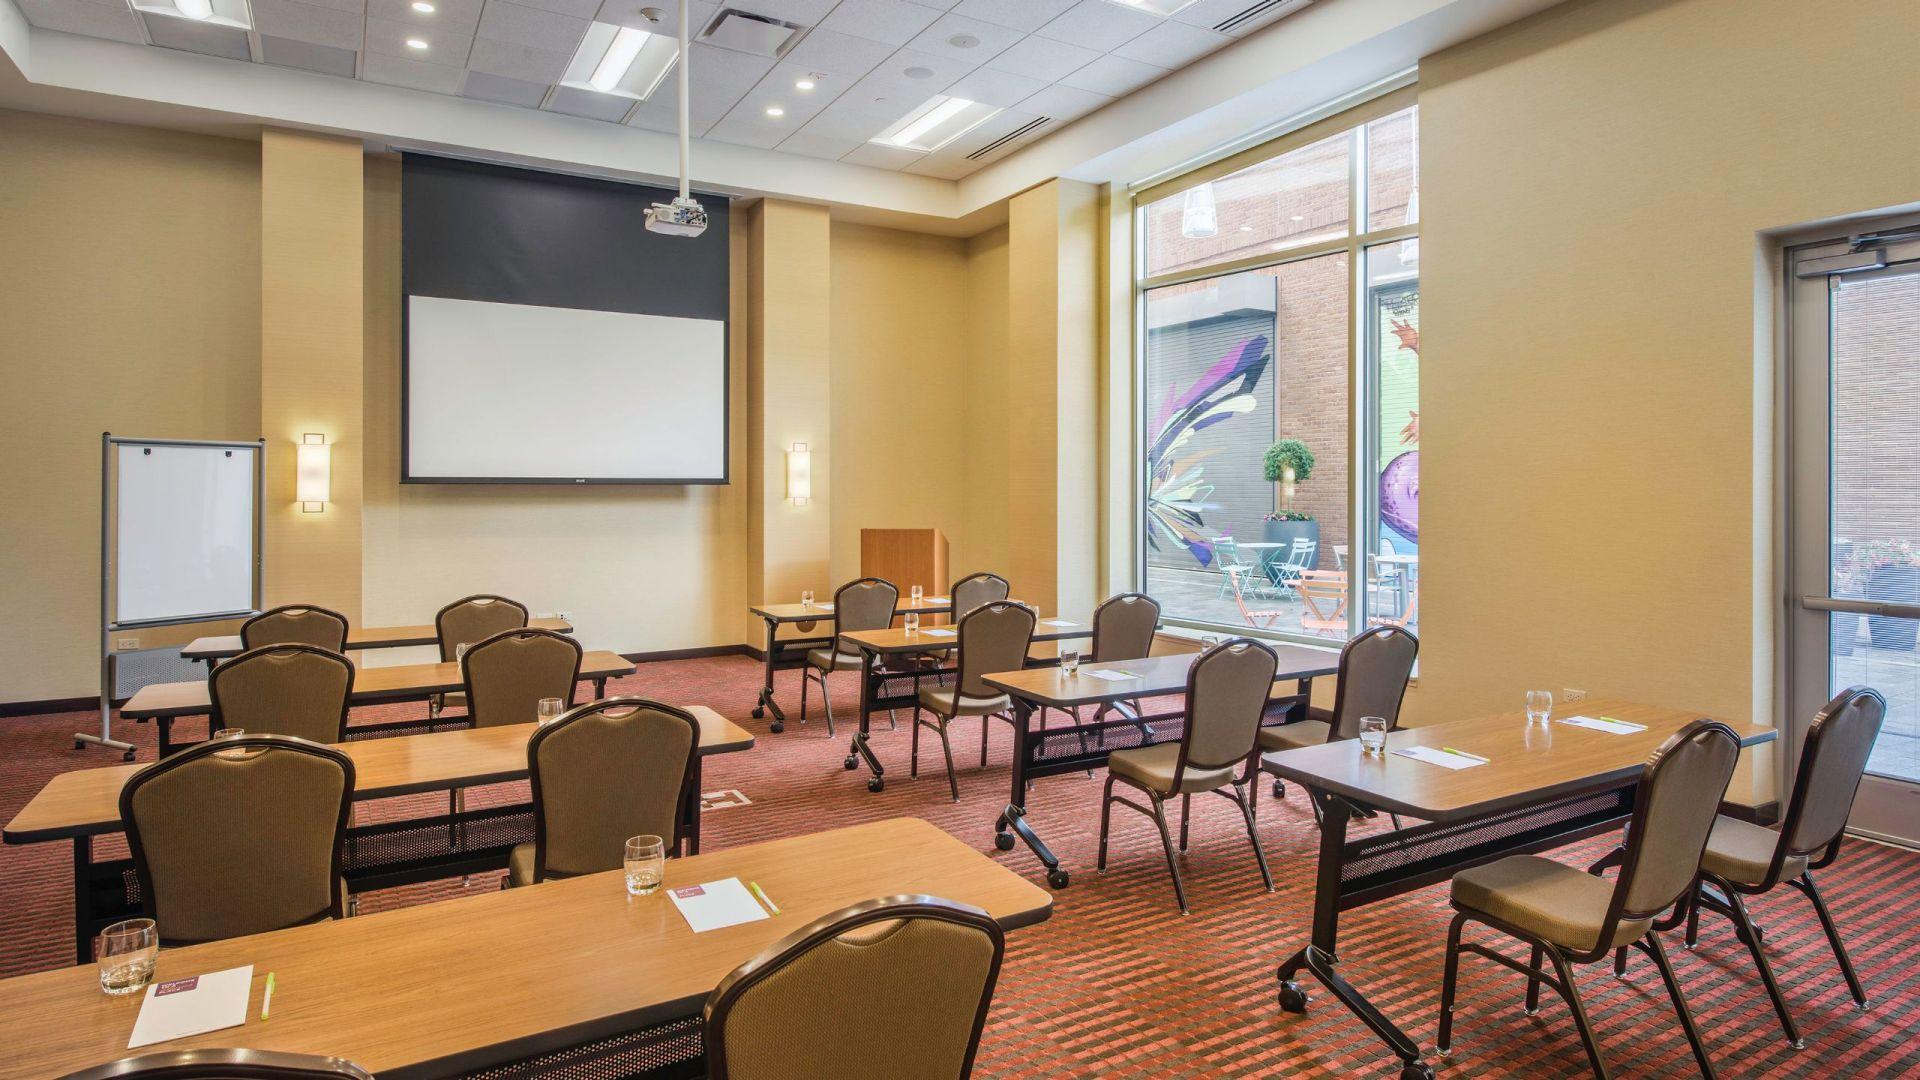 Hyatt Meeting Room in Cleveland Ohio